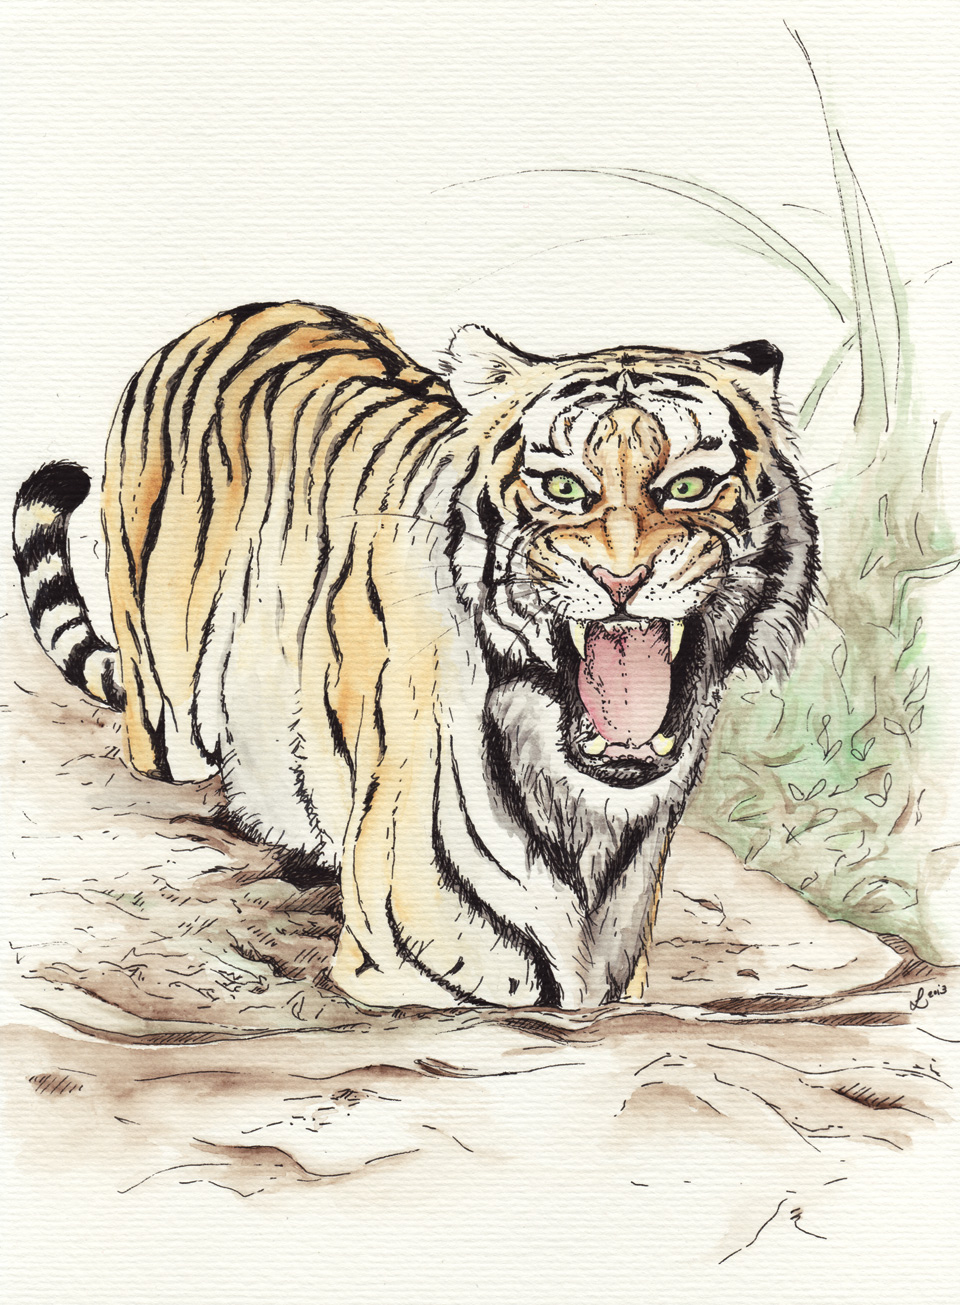 """Grrrrroarrrr!"" –Tiger im Wasser."